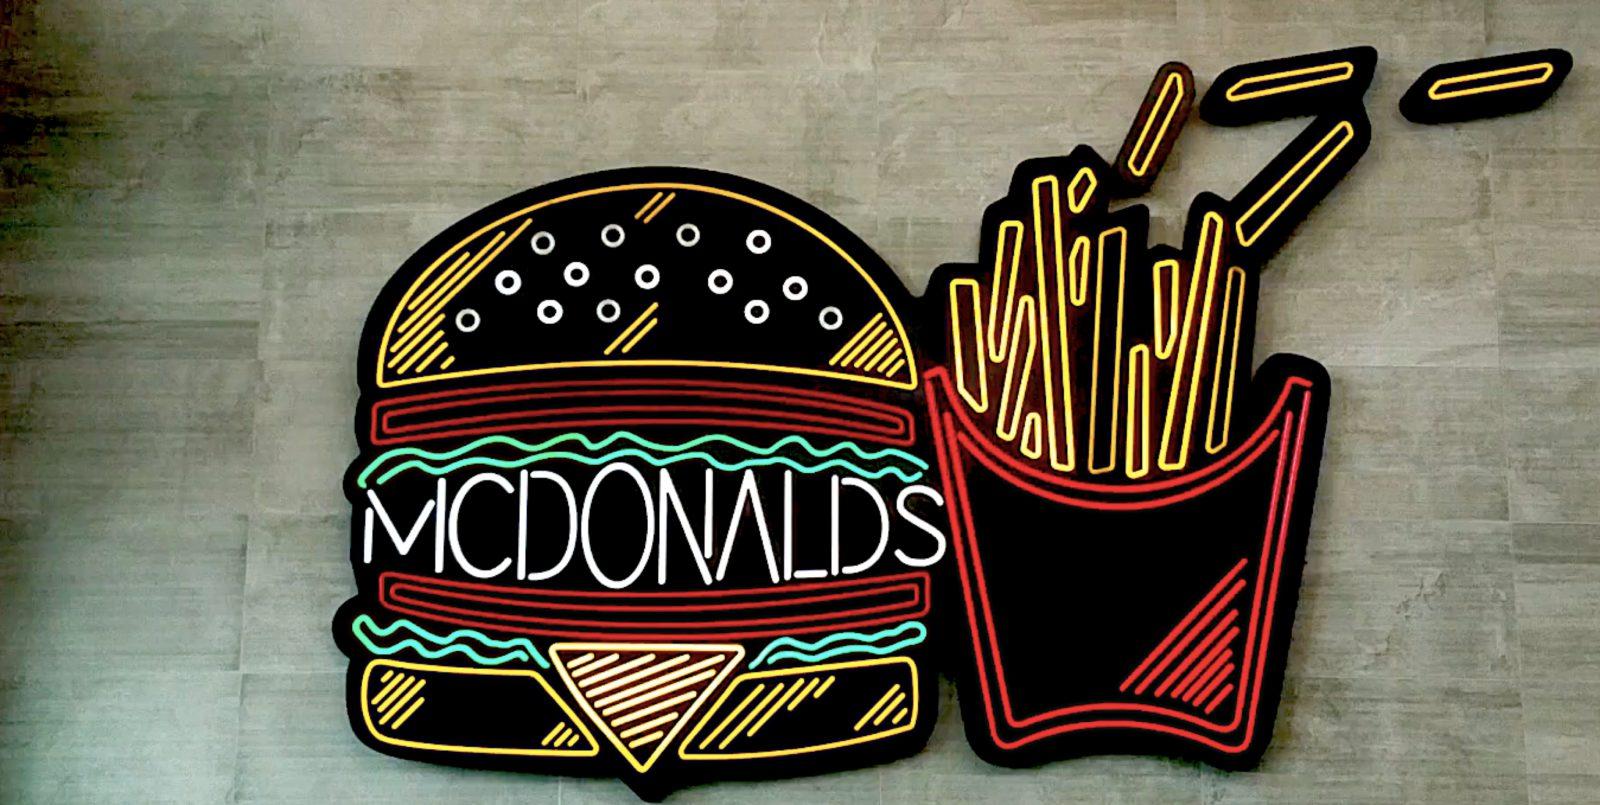 McDonalds 5G